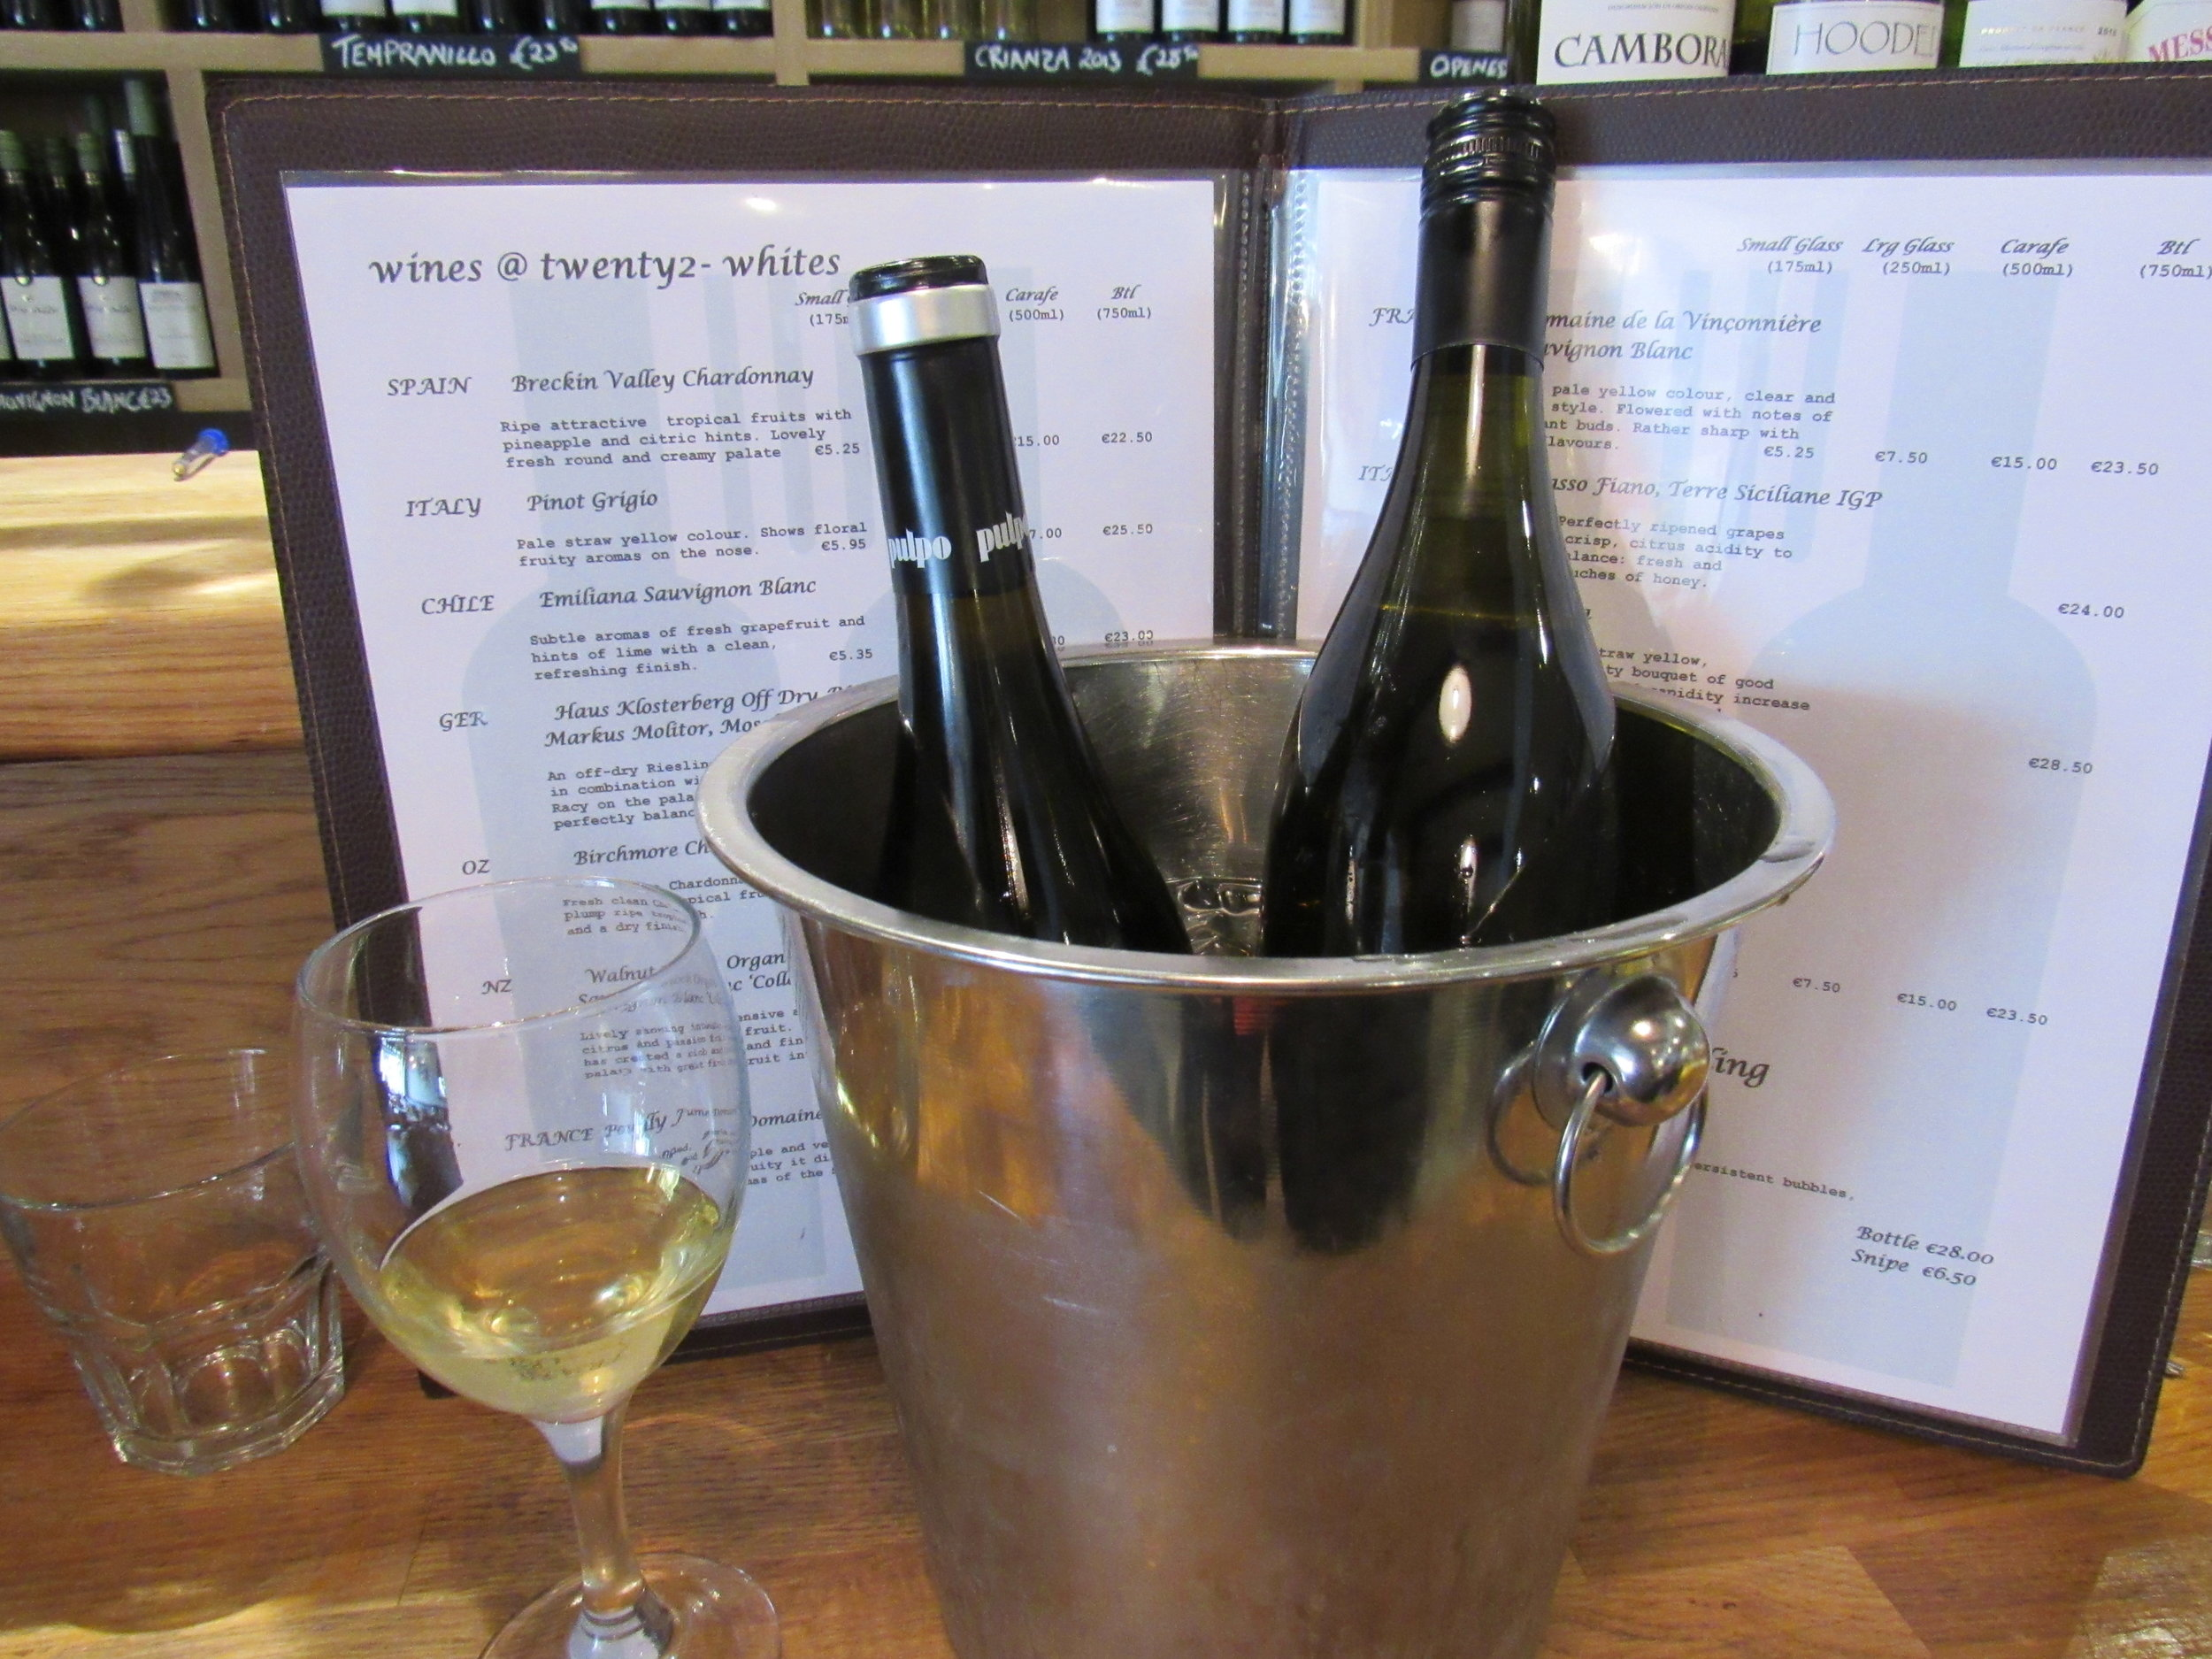 wines by the glass at twenty2 restaurant, dublin 9